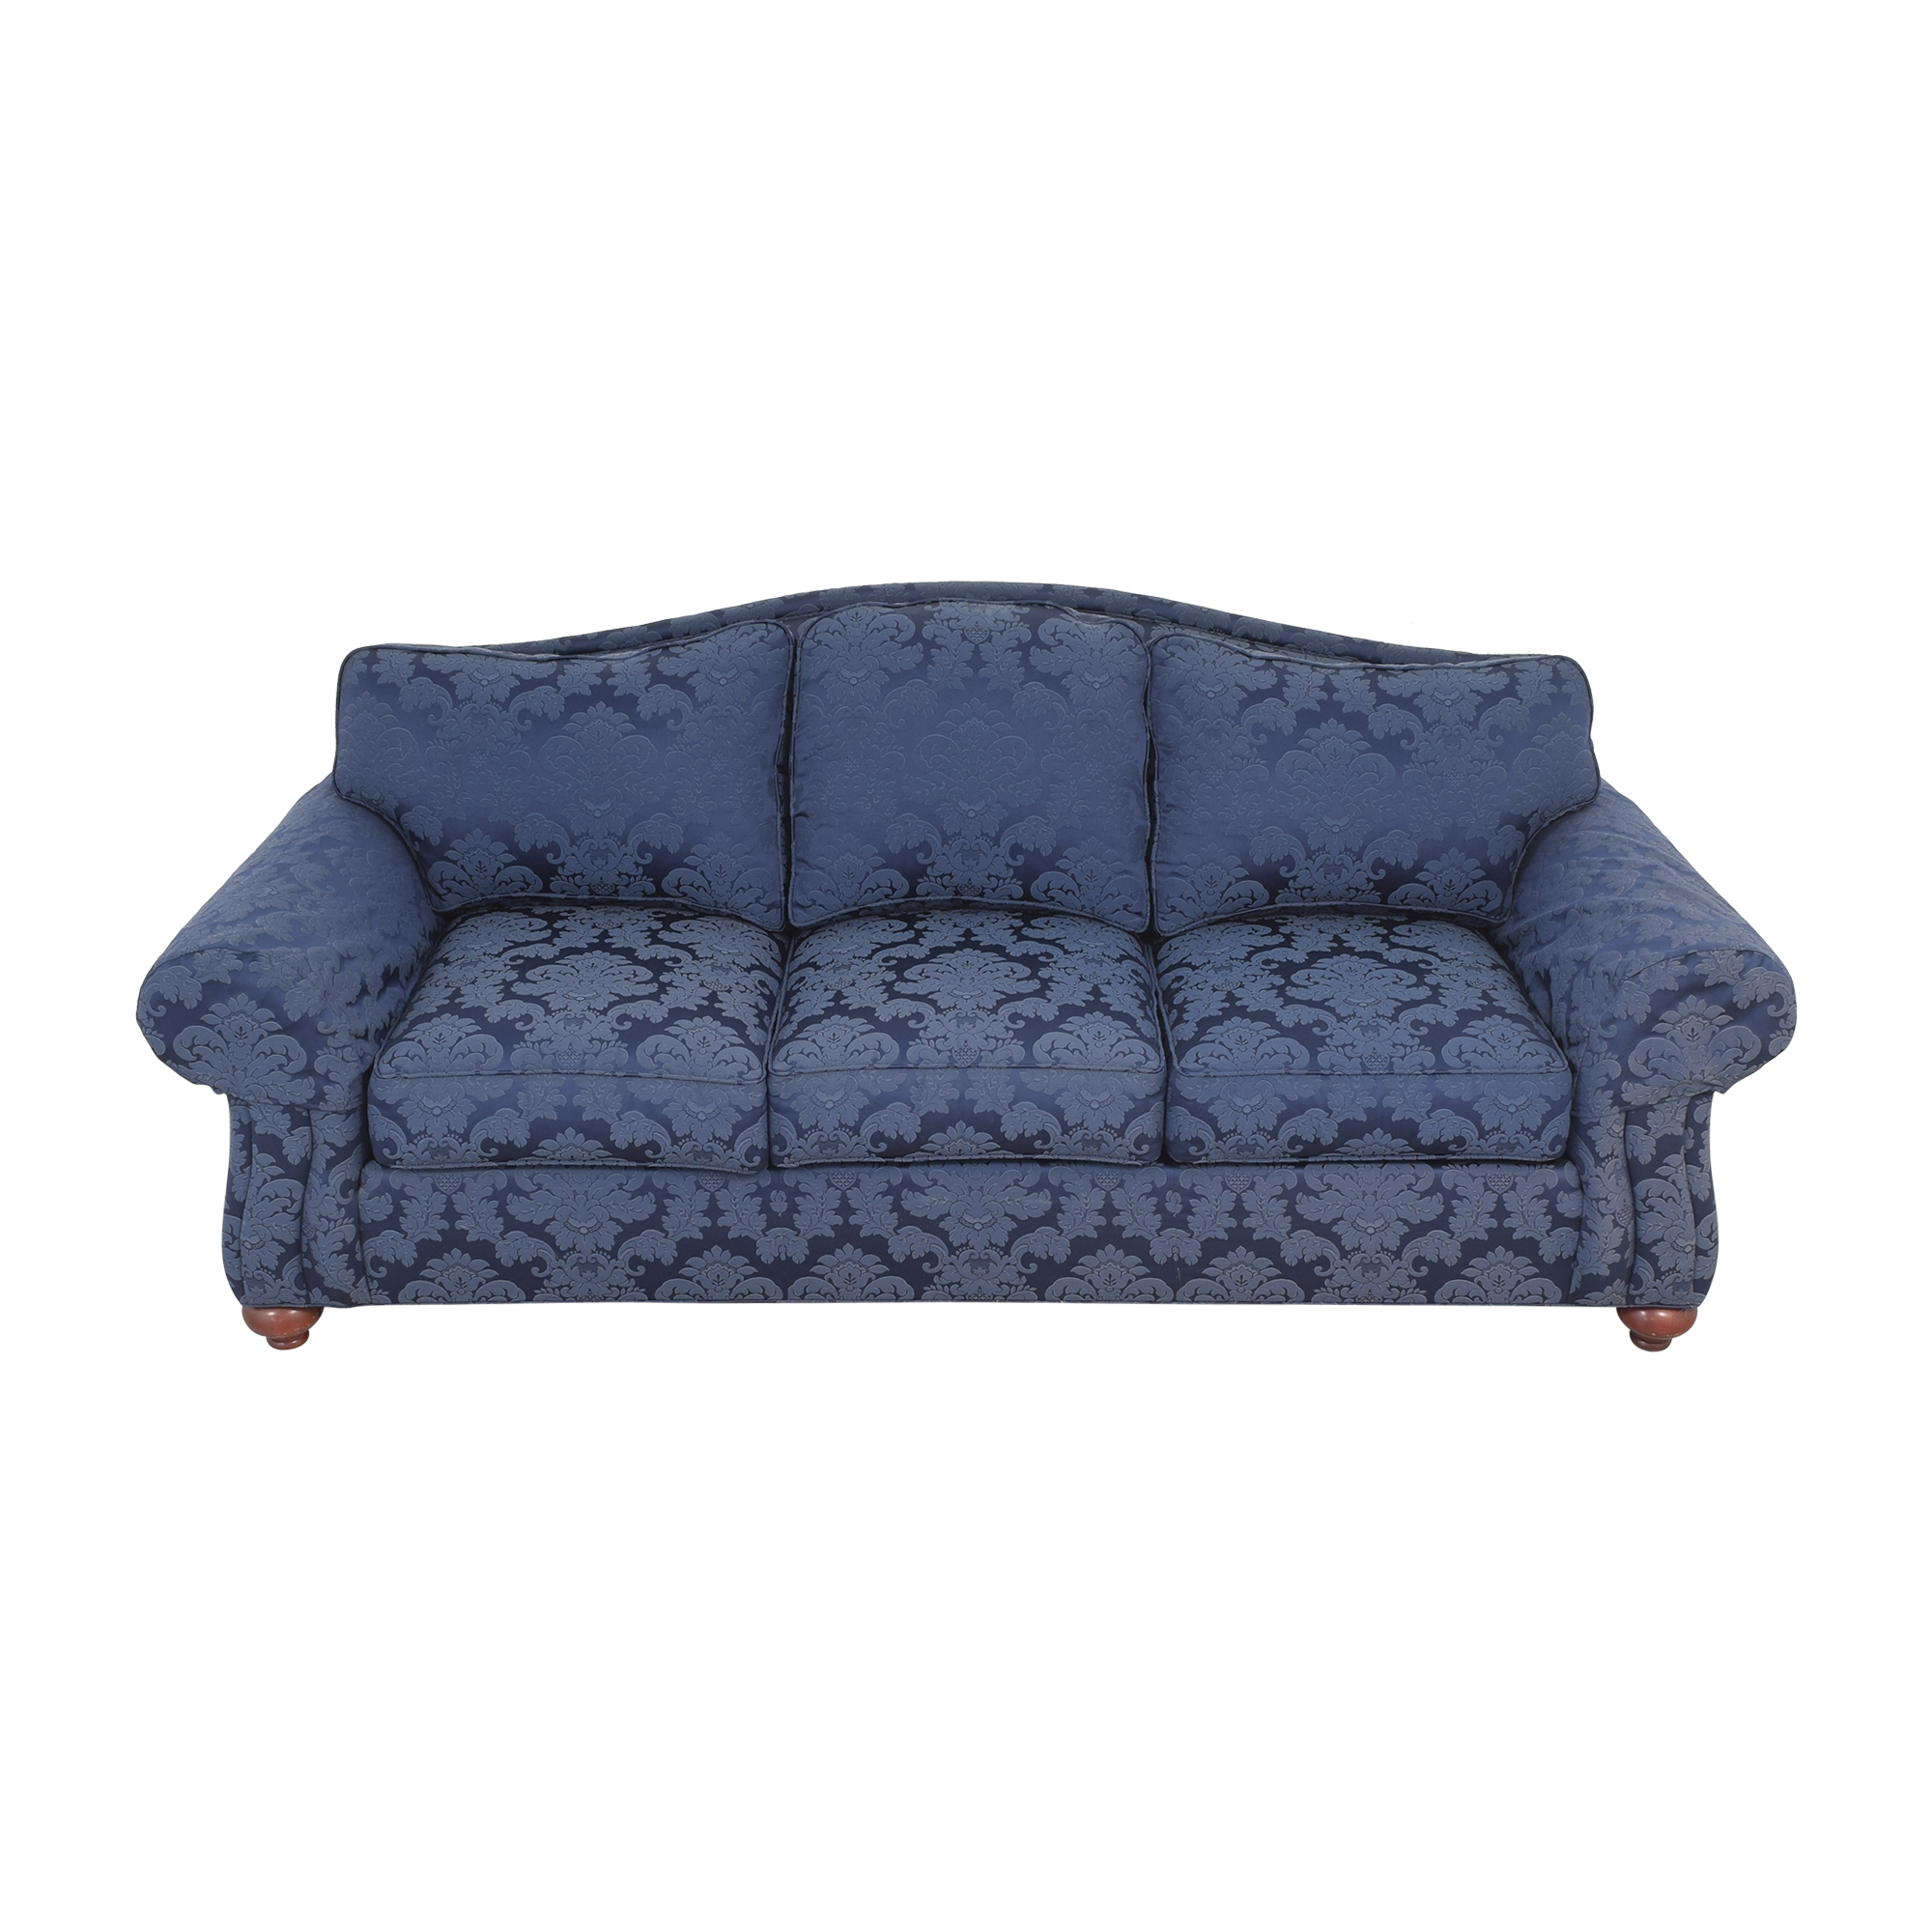 buy Ethan Allen Ethan Allen Whitney Damask Sofa online